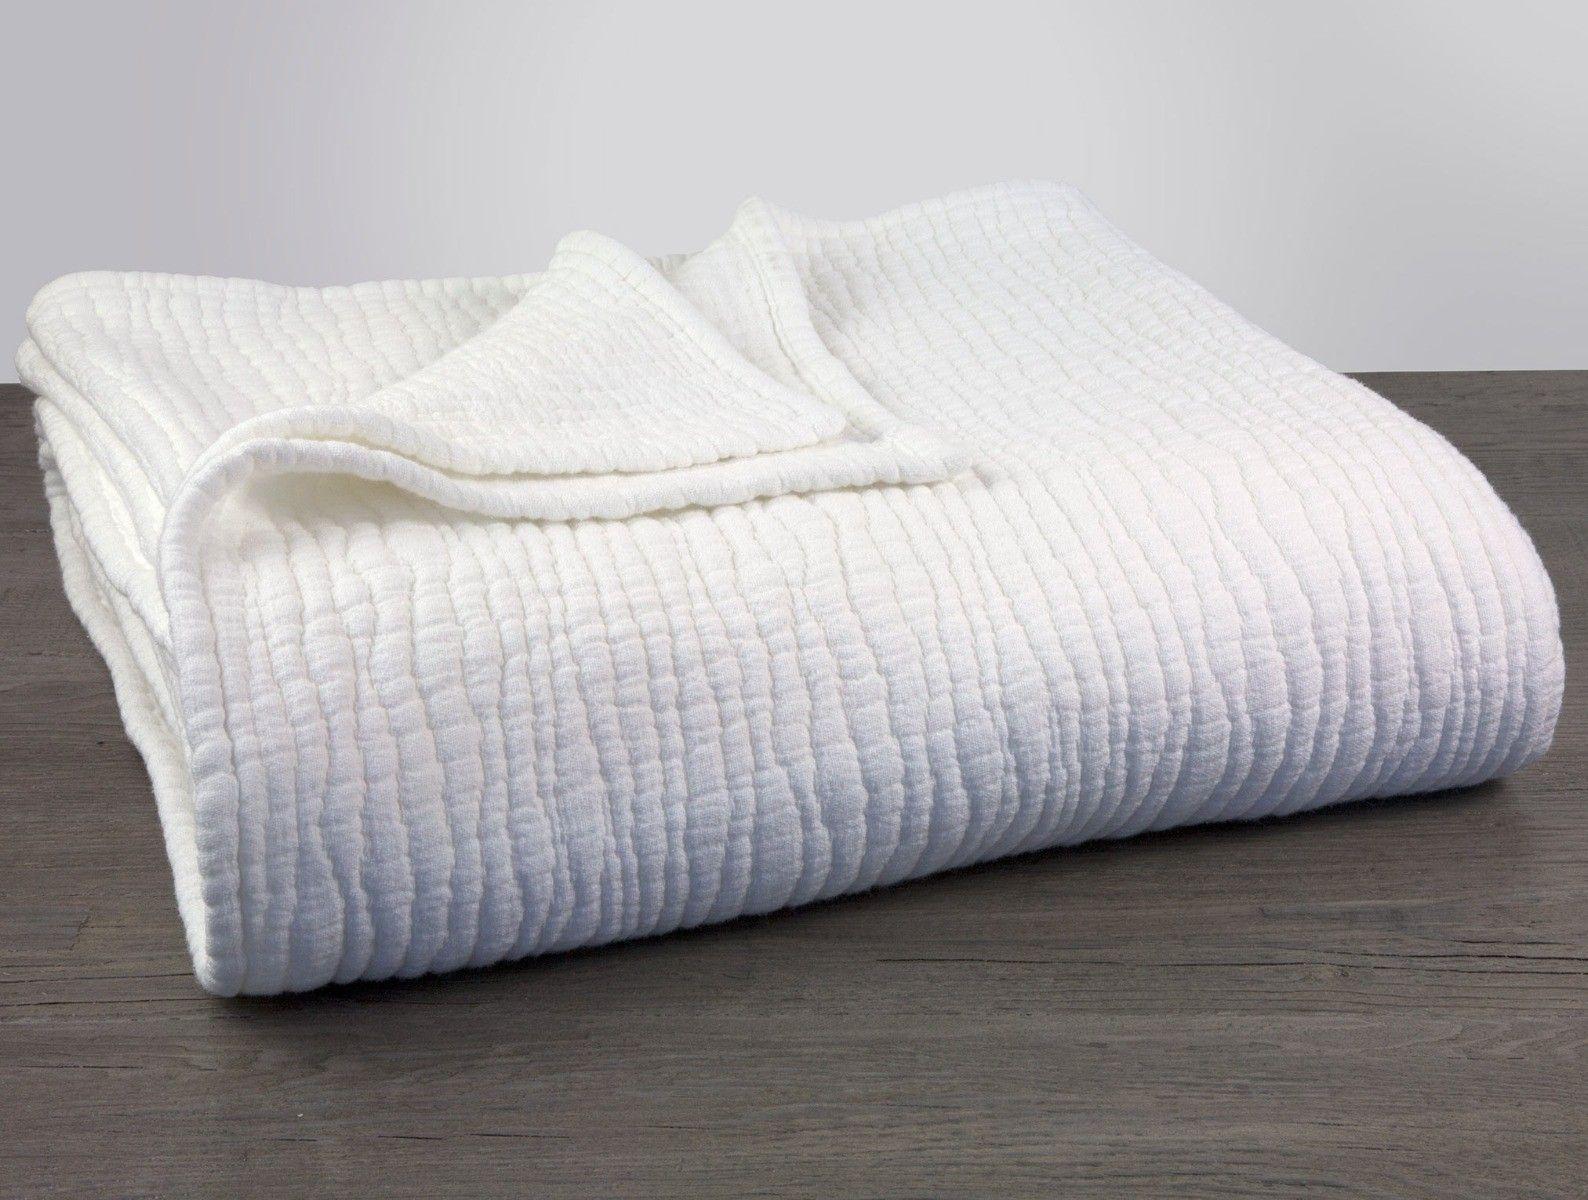 Coyuchi Wave Matelasse Baby Blanket Gray Chambray In 2020 Blanket Alpine White Waves